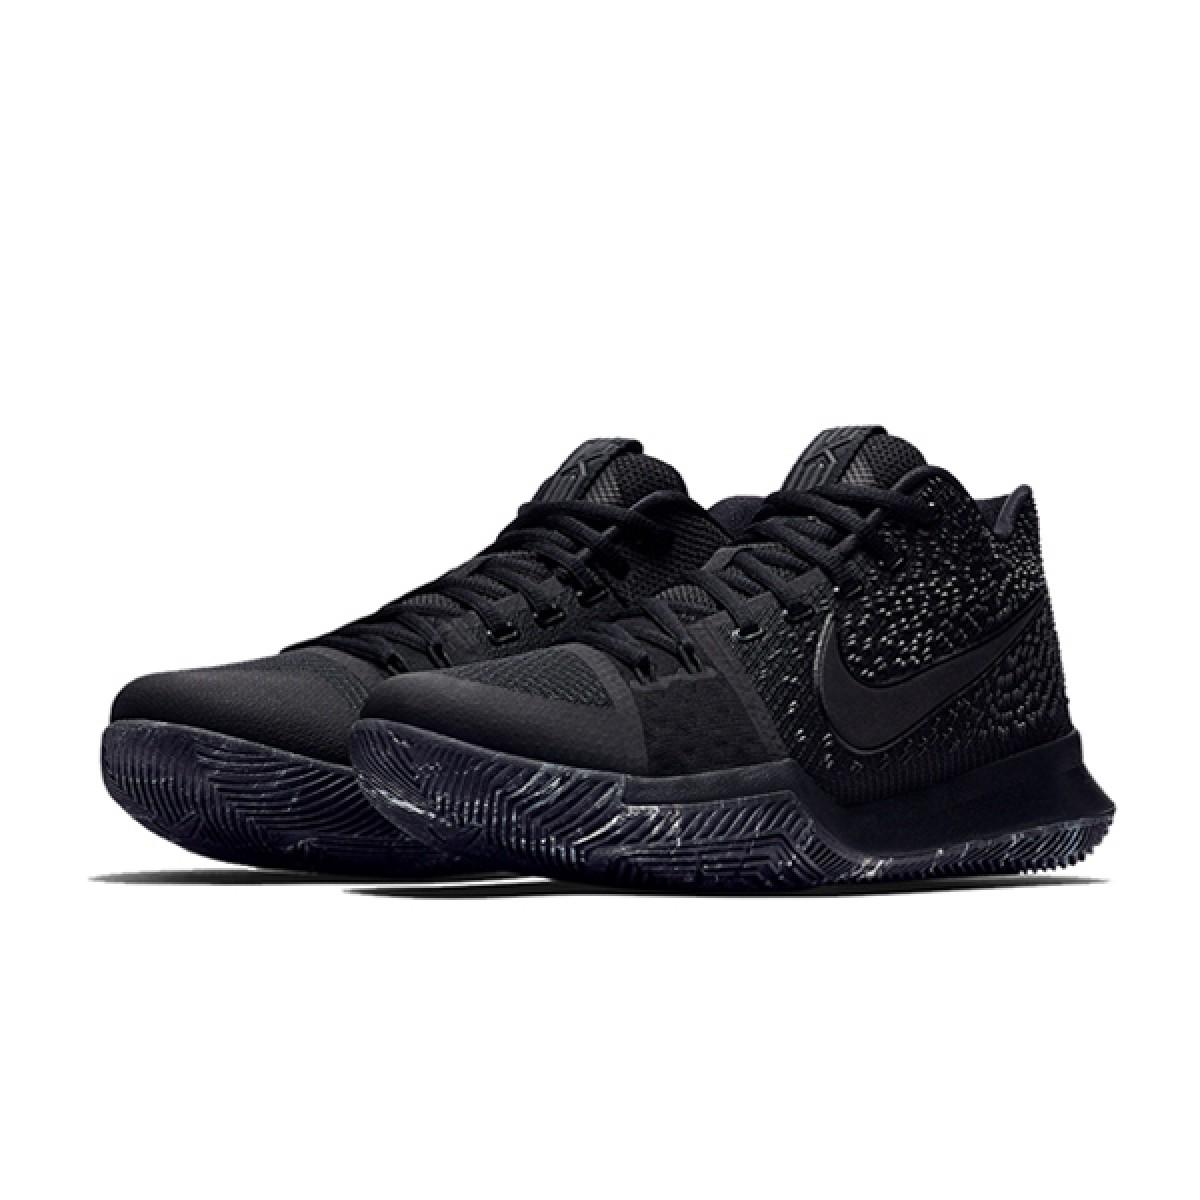 Nike Kyrie 3 'Marble' 852395-005